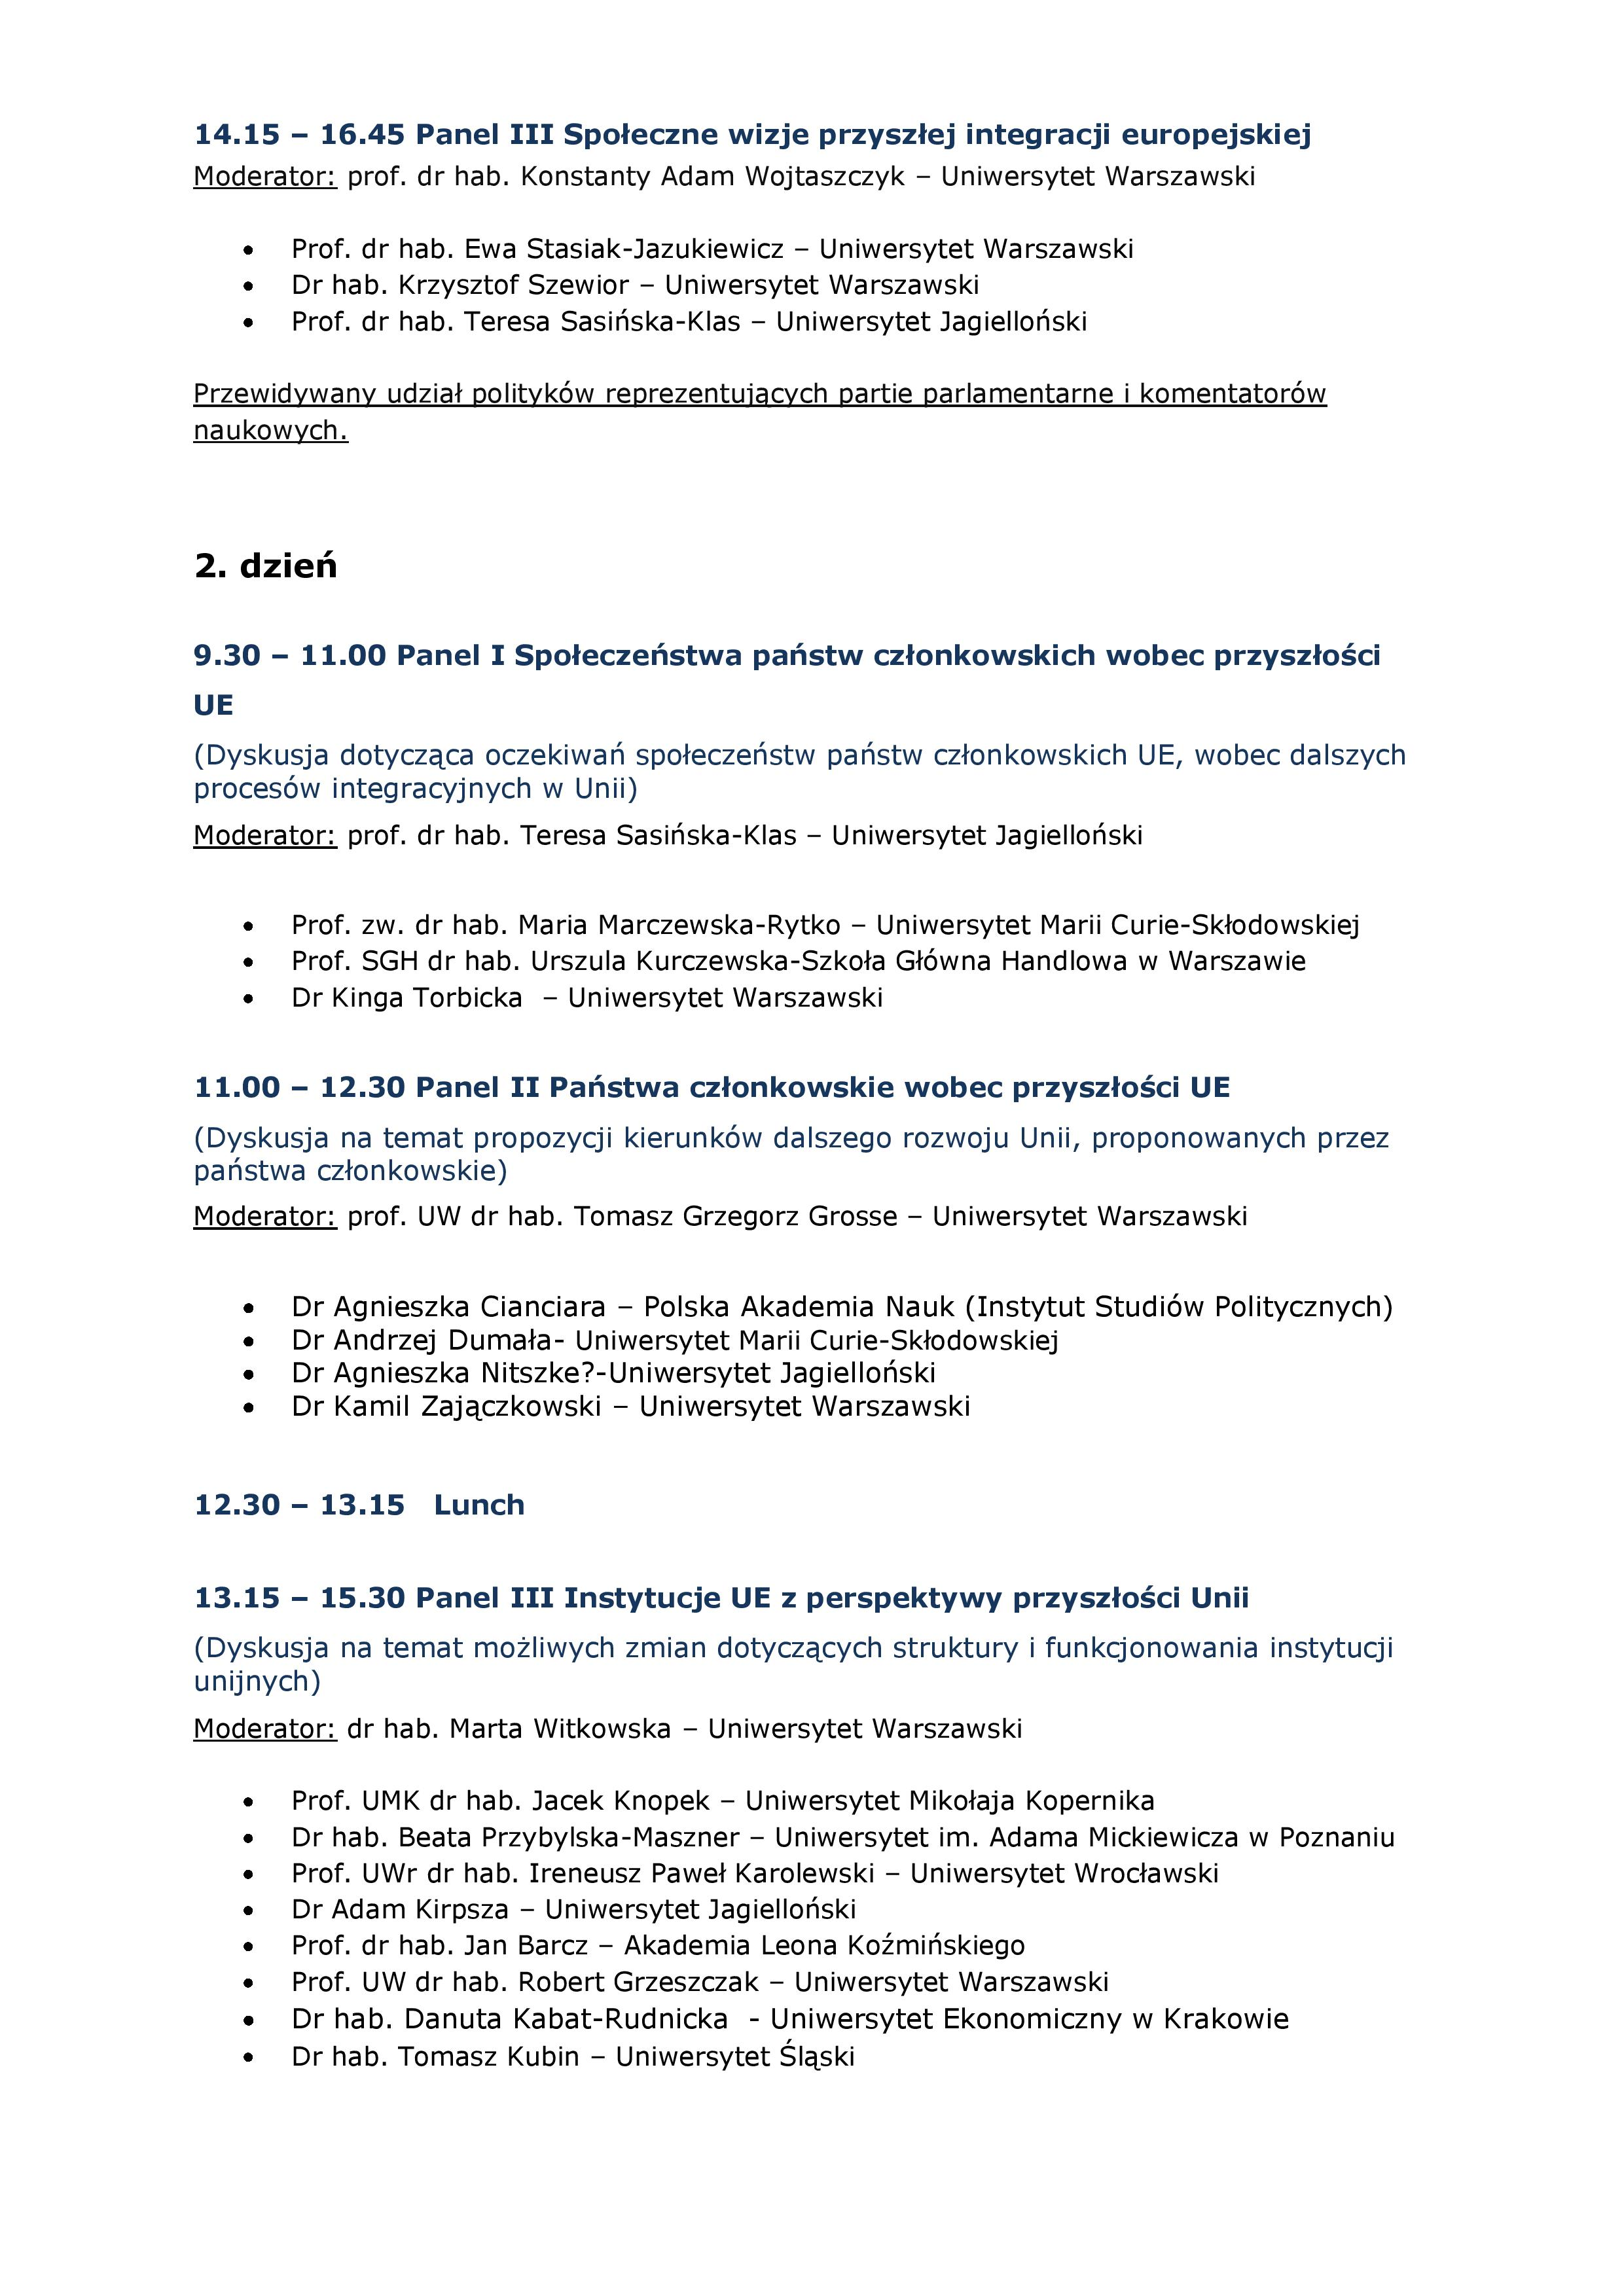 Program Konferencji Plan Junckera ARacja Stanu Polski Pol5.12 Page 003